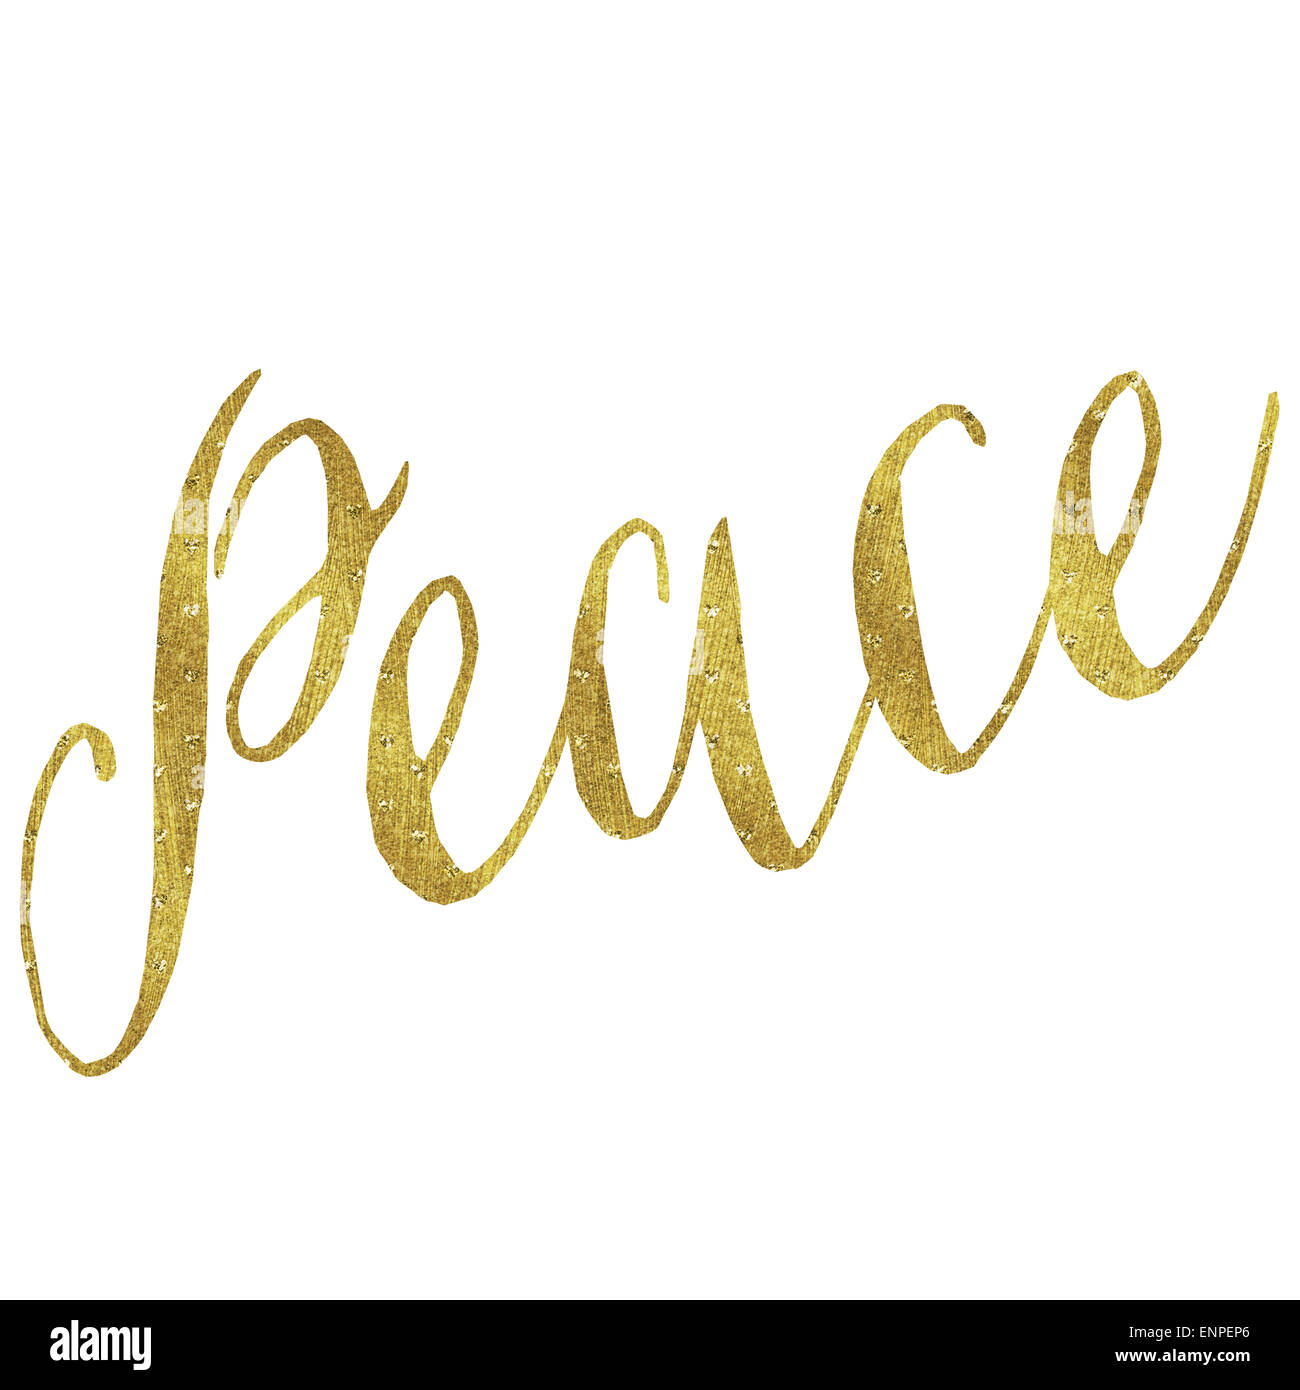 Faux Frieden Gold Folie Metallic Glitter inspirierende Weihnachten ...